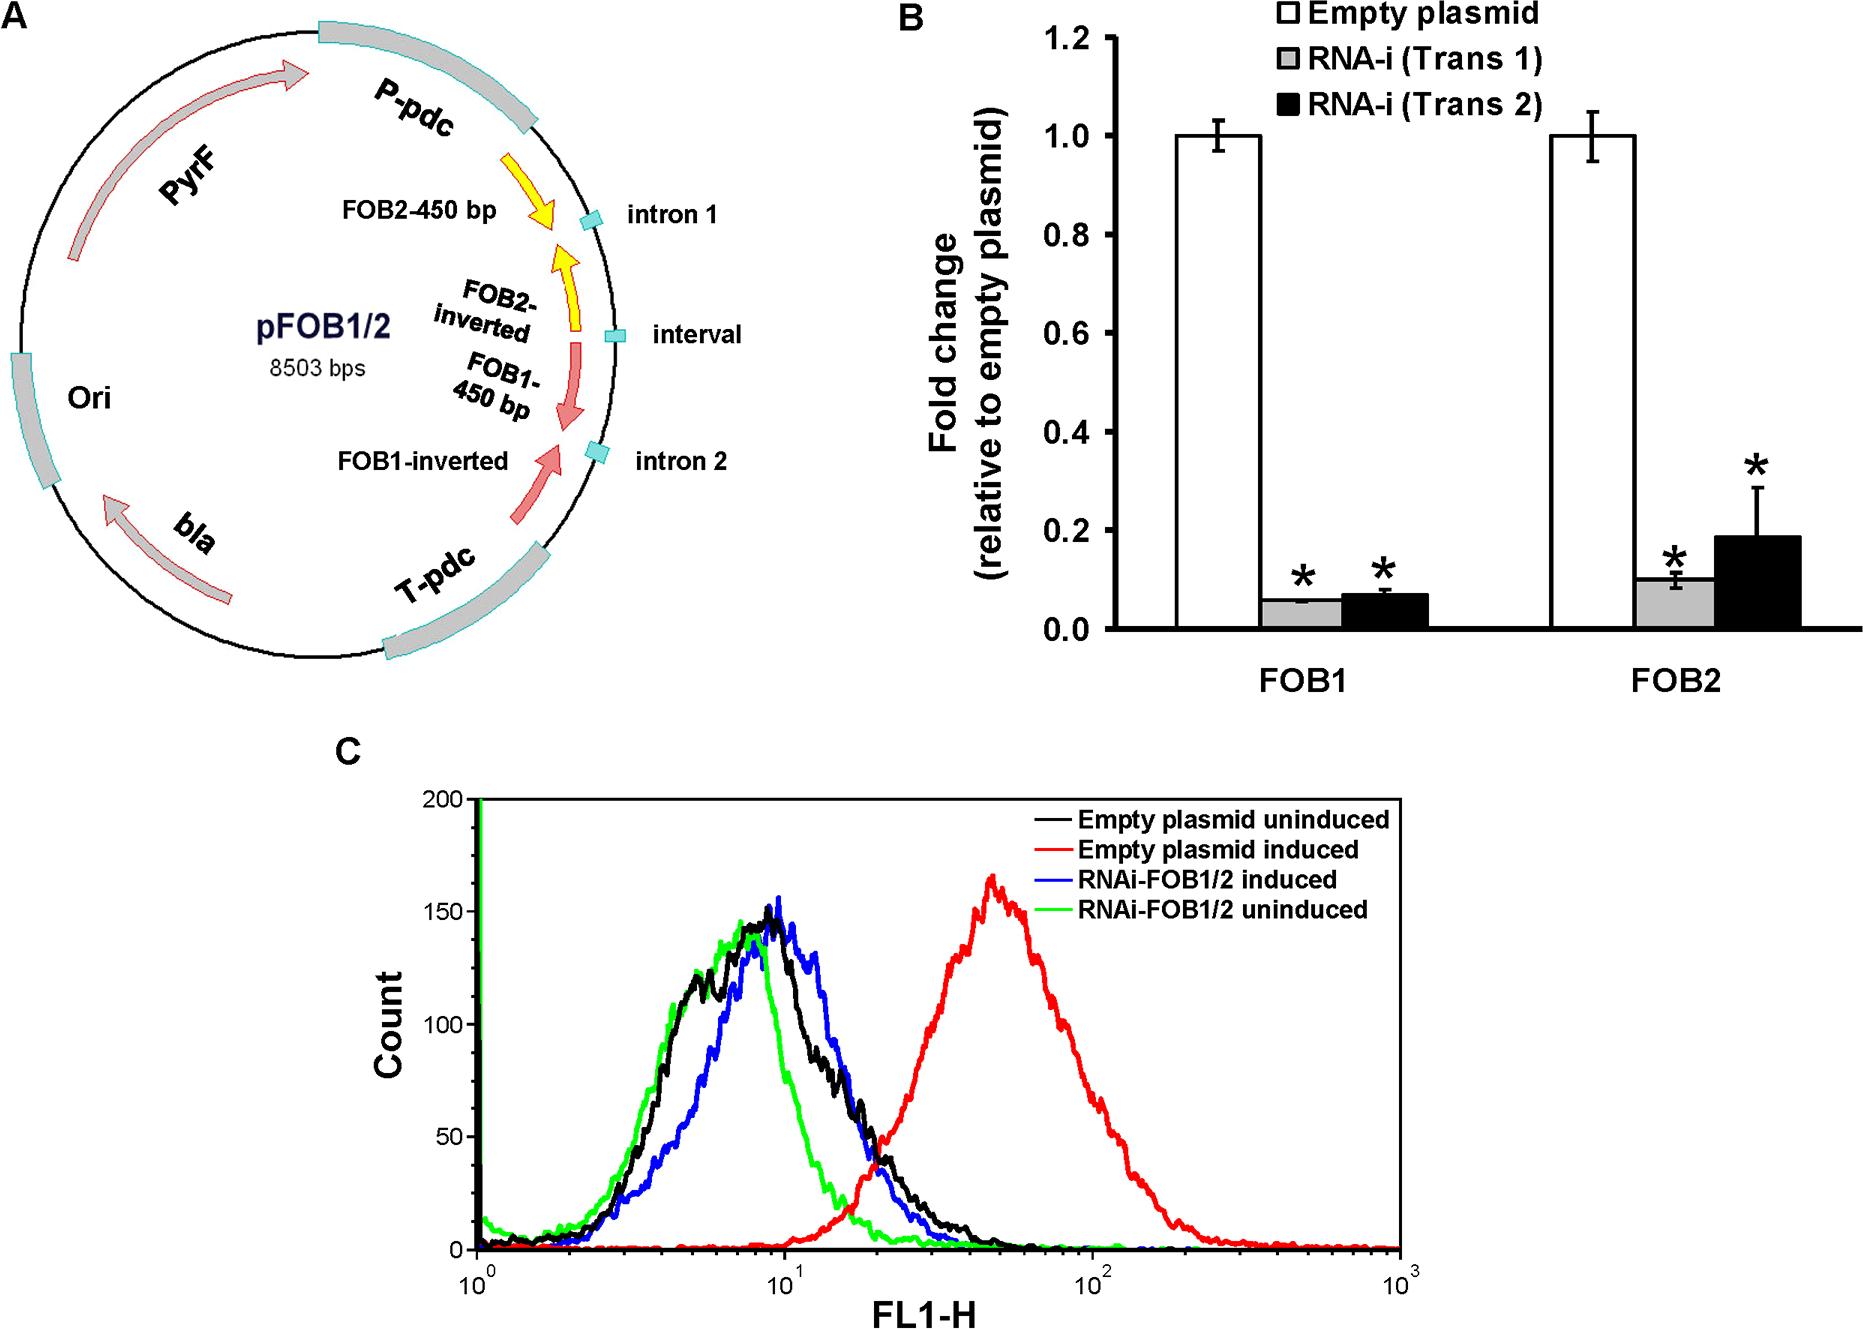 Dual gene inhibition strategy completely abrogates <i>FOB1</i> and <i>FOB2</i> expression.